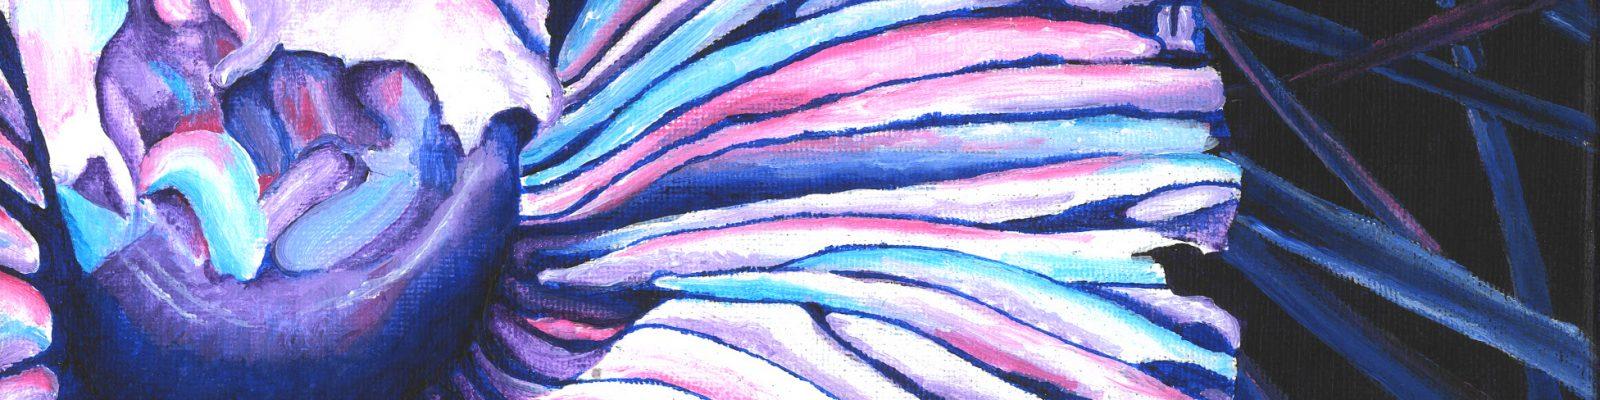 "Mushroom. Acrylic. 10""x10"" Brandi Malarkey, artist."